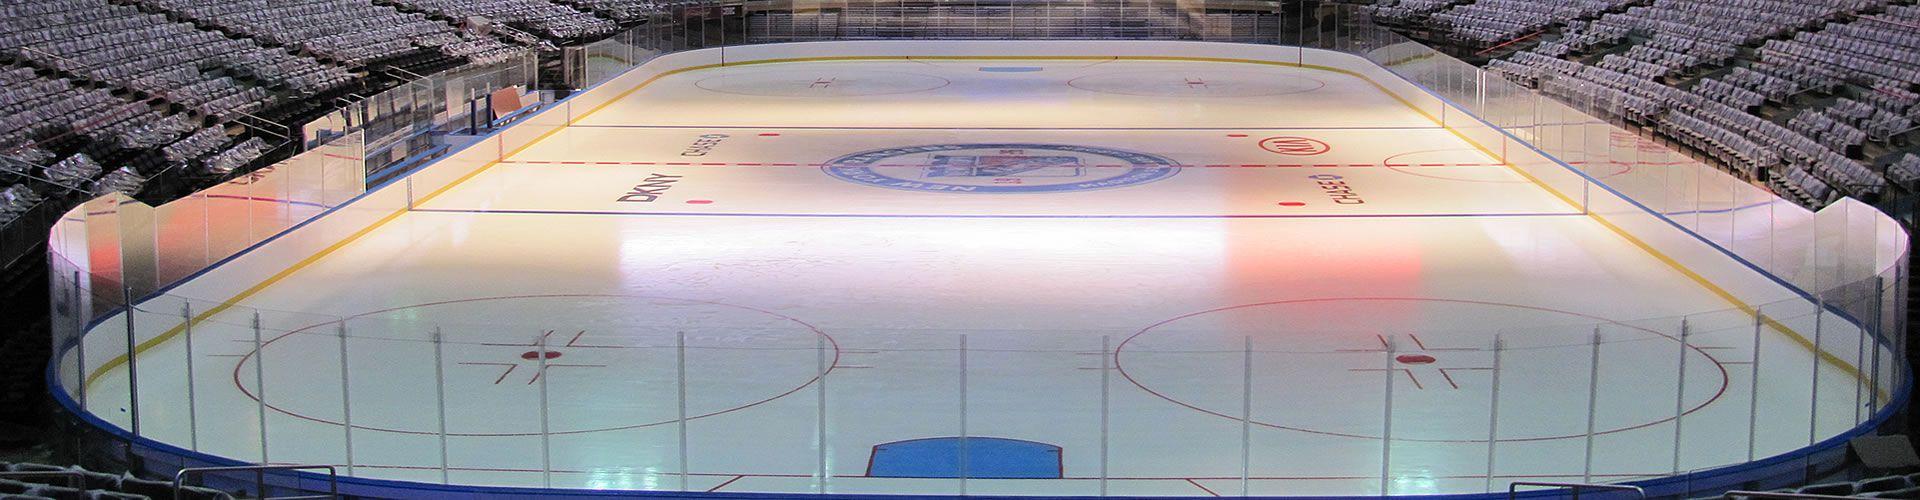 хоккейная разметка фото